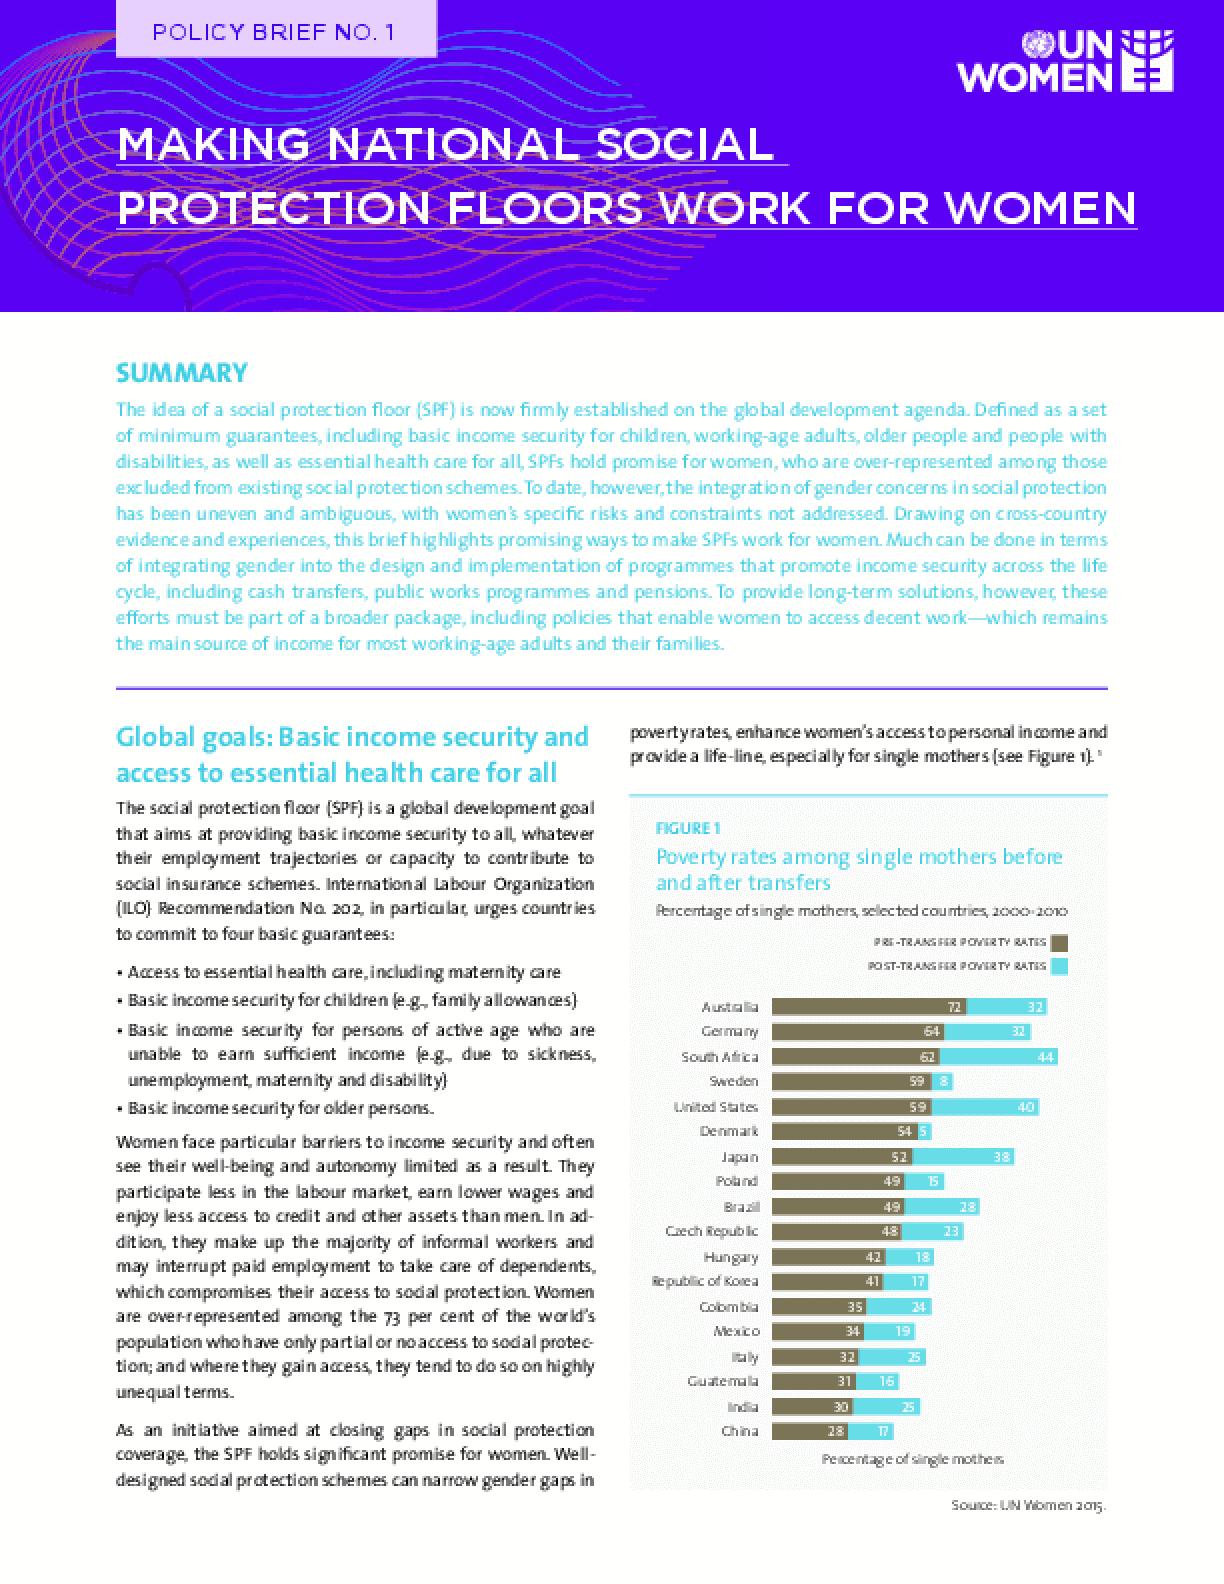 Making National Social Protection Floors Work for Women